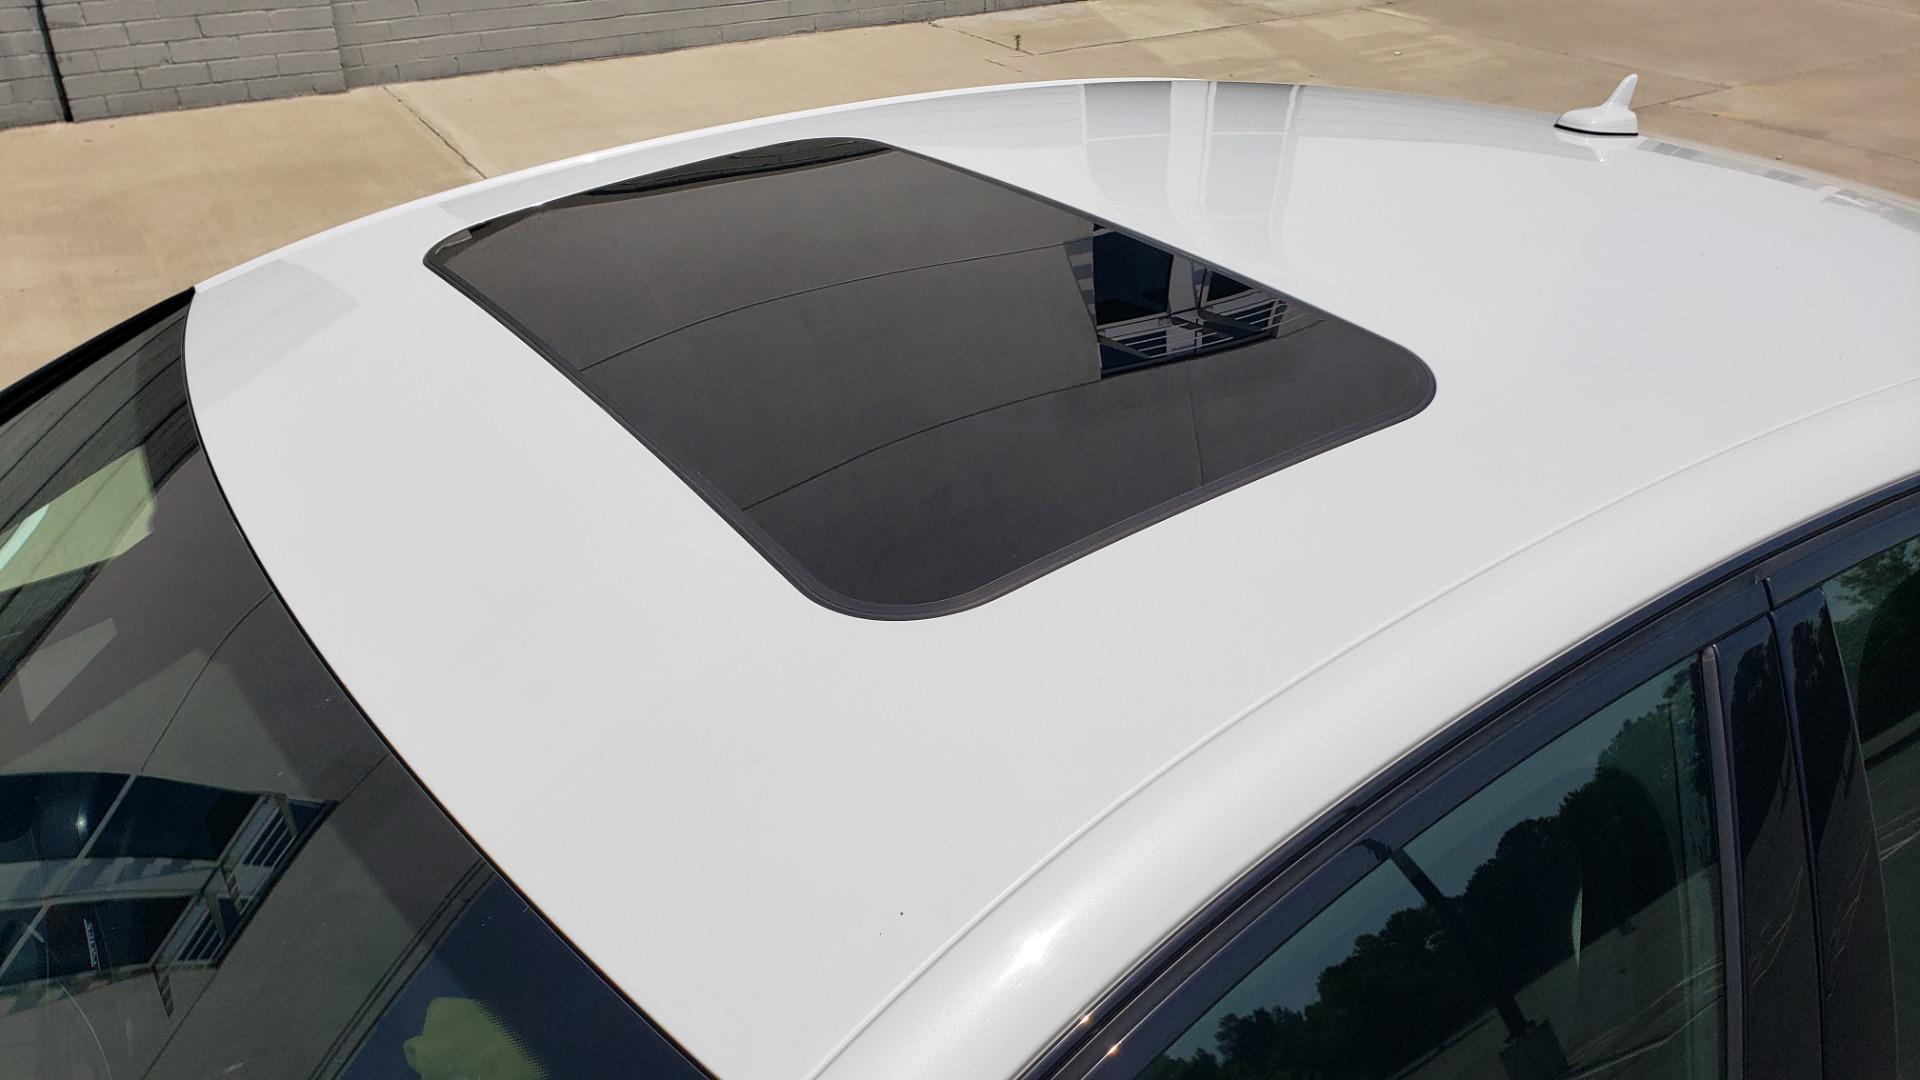 Used 2017 Audi A6 PRESTIGE SEDAN 3.0T / NAV / SUNROOF / BLACK OPTIC / CLD WTHR / REARVIEW for sale $30,797 at Formula Imports in Charlotte NC 28227 12